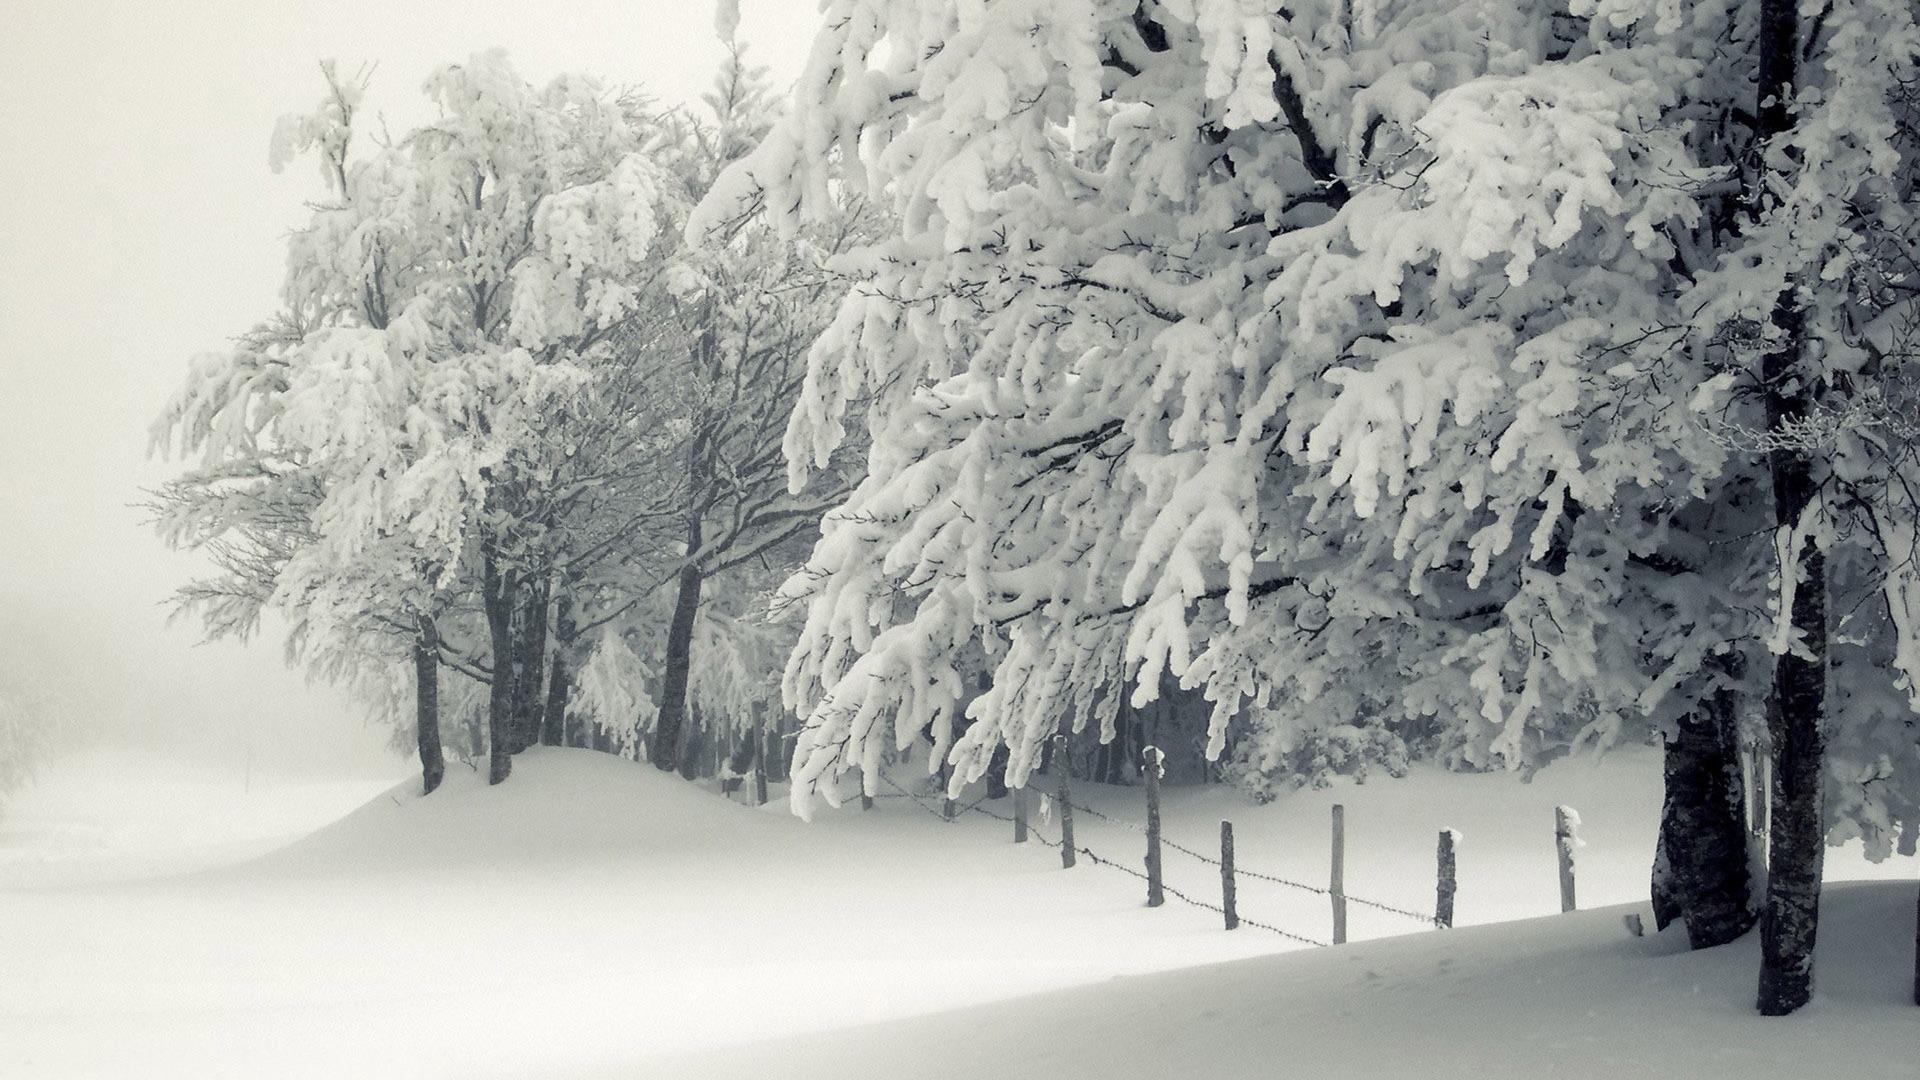 Snowy trees wallpaper 11605 1920x1080